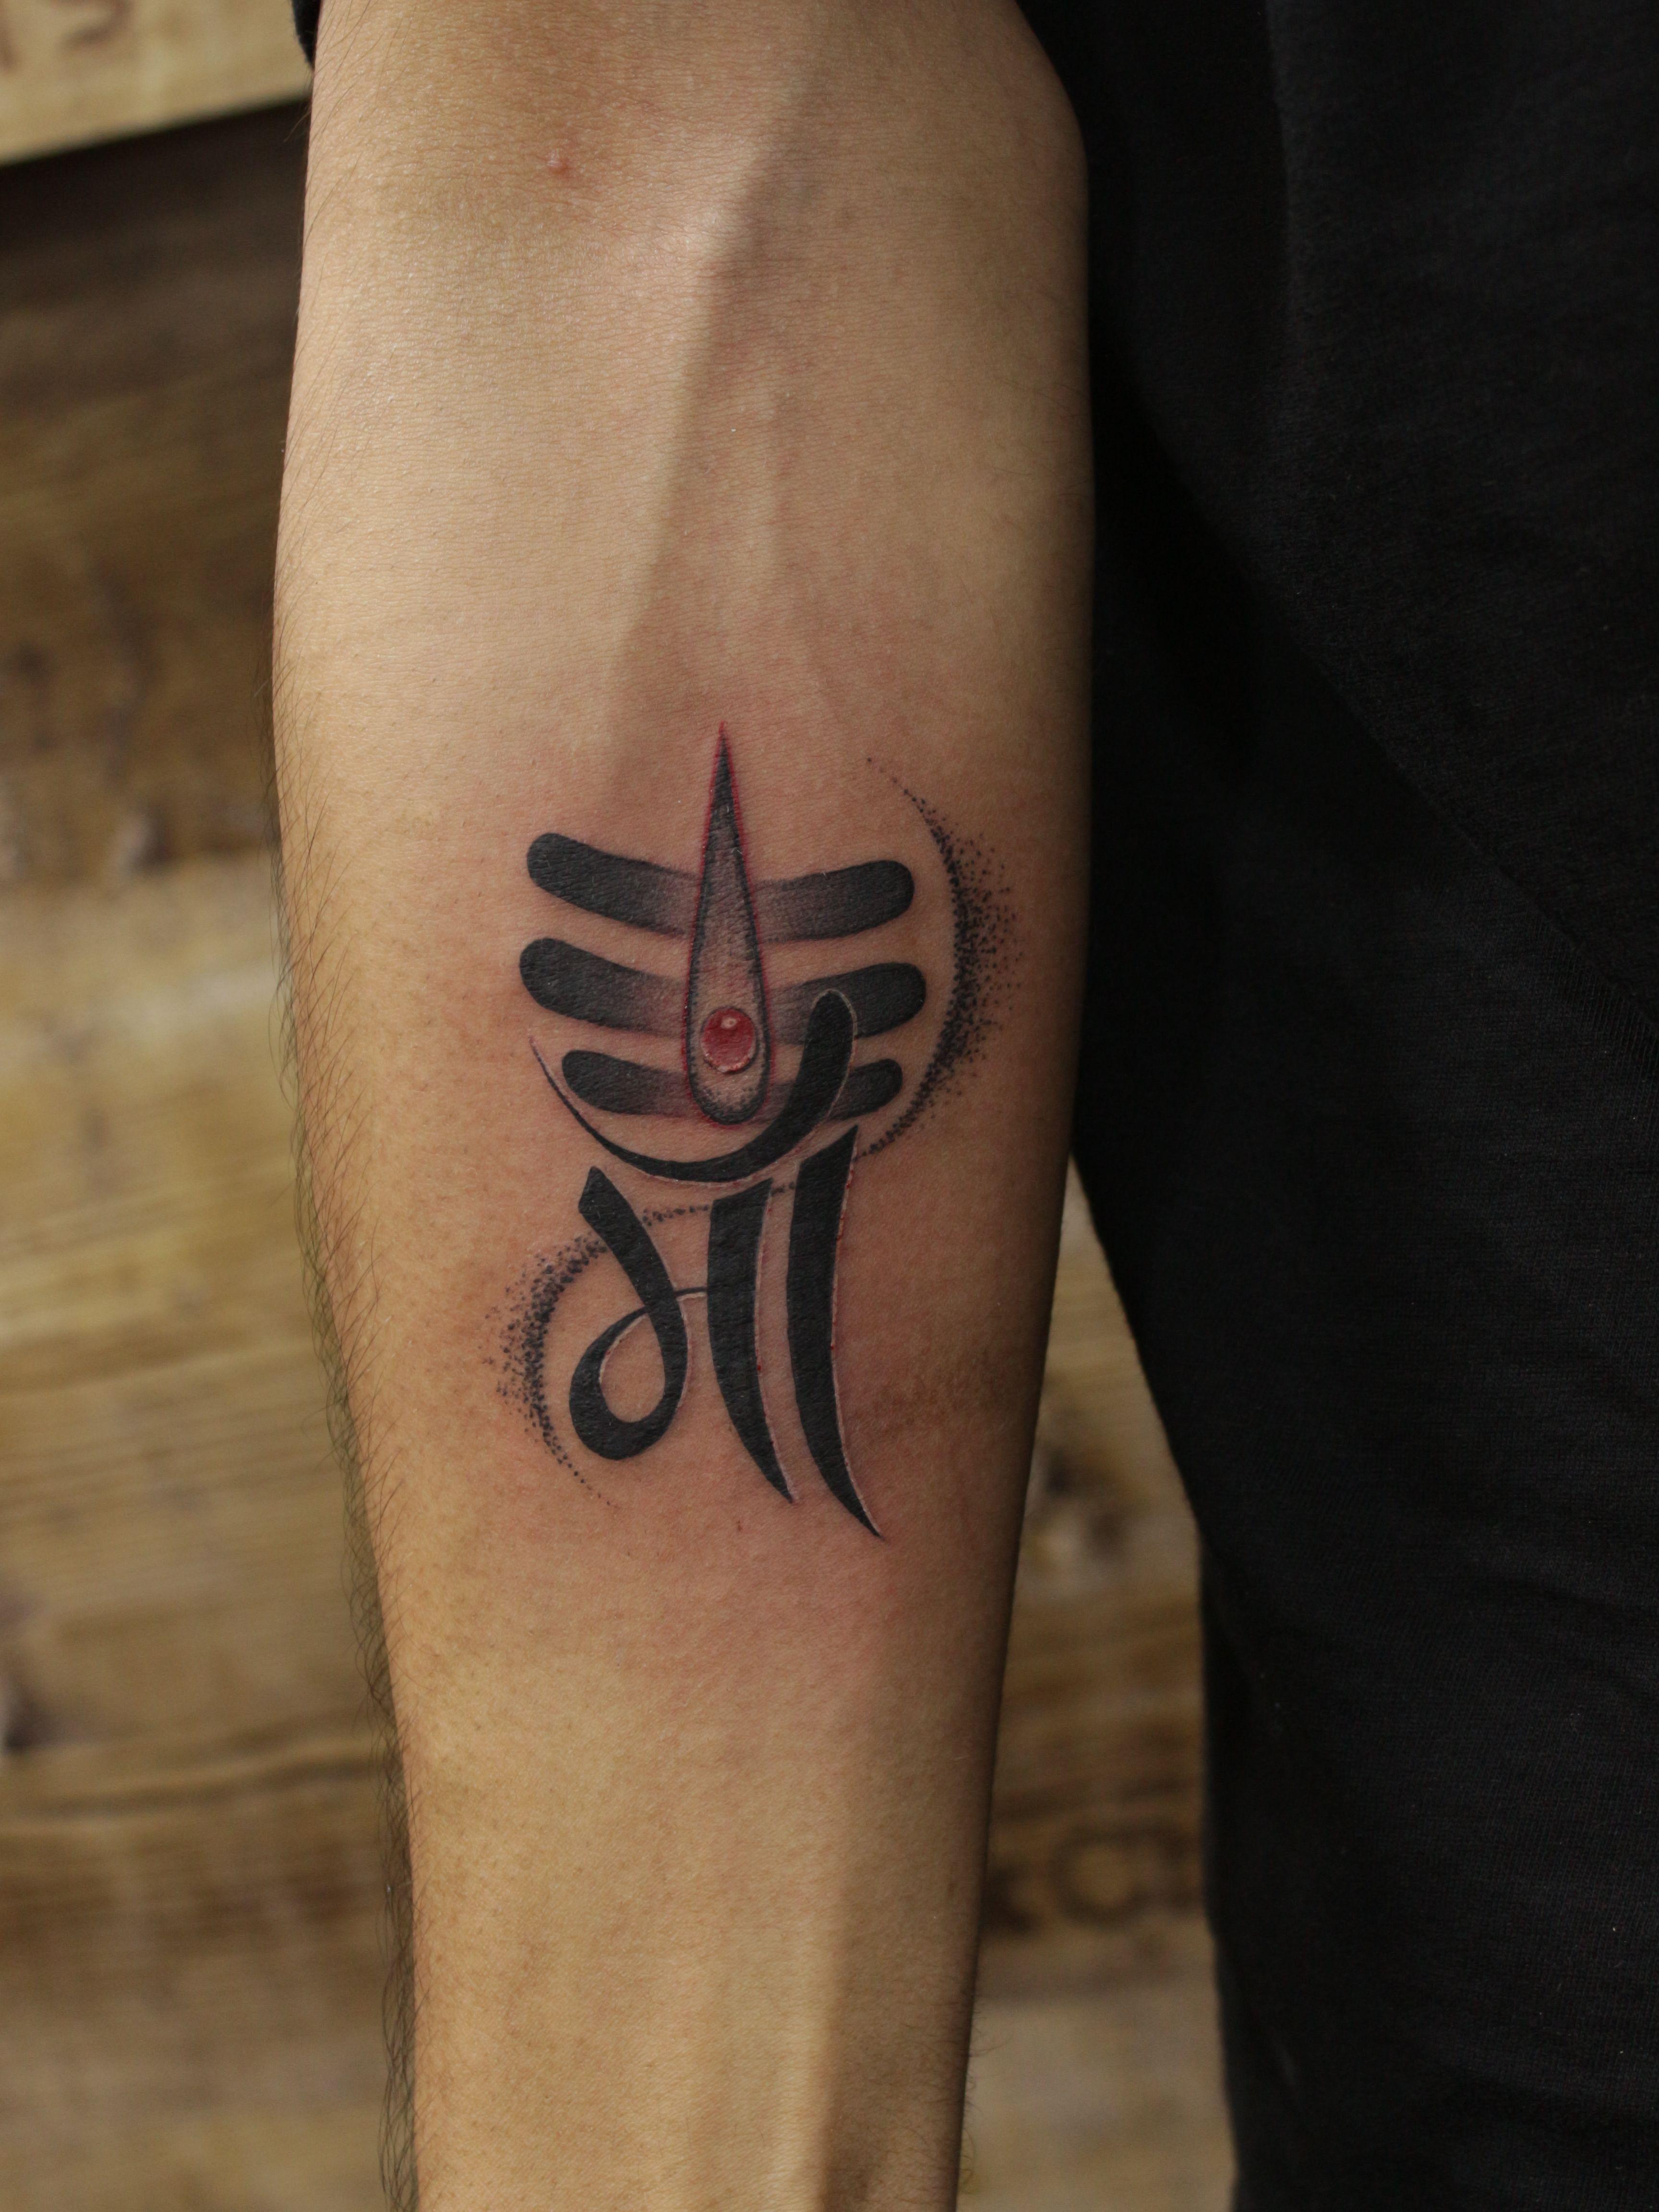 Lord Shiva Mother Tattoo Made On Wrist By Big Guys Tattoo Studio In Mumbai Cst Mother Tattoos Mom Dad Tattoos Mom Tattoos